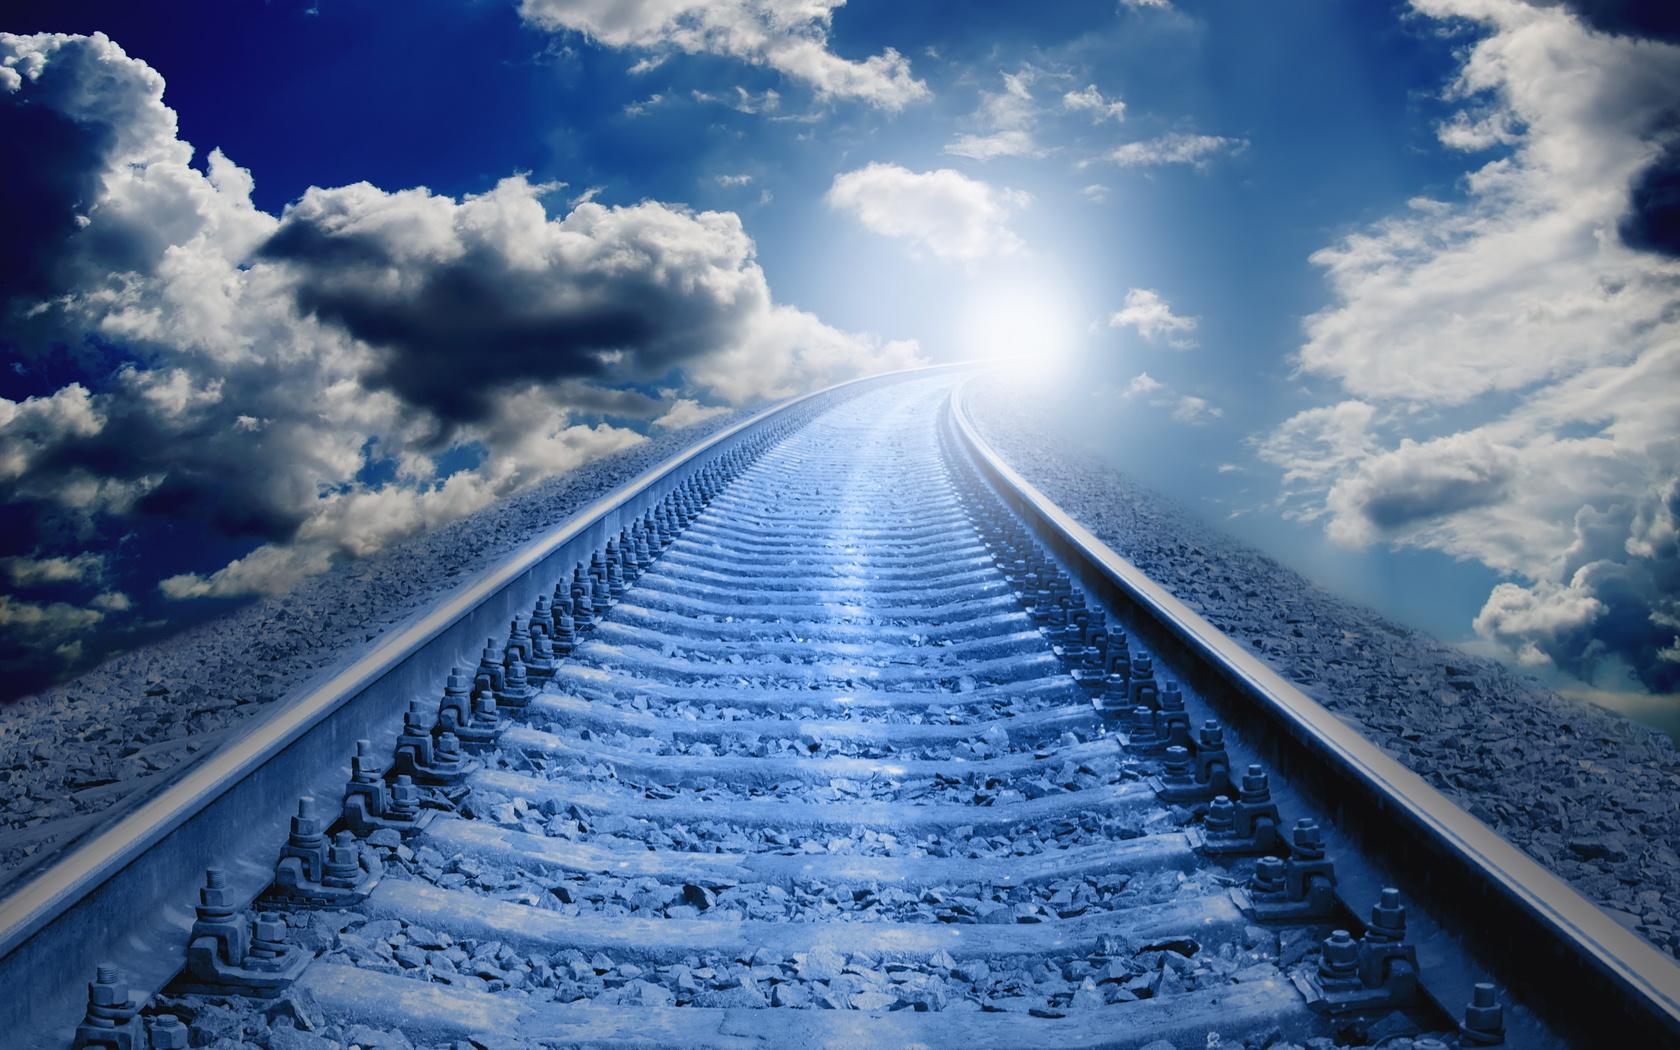 жд, путь, рельсы, шпалы, небо, фотошоп, свет, креатив, облака, фэнтези, фантазия